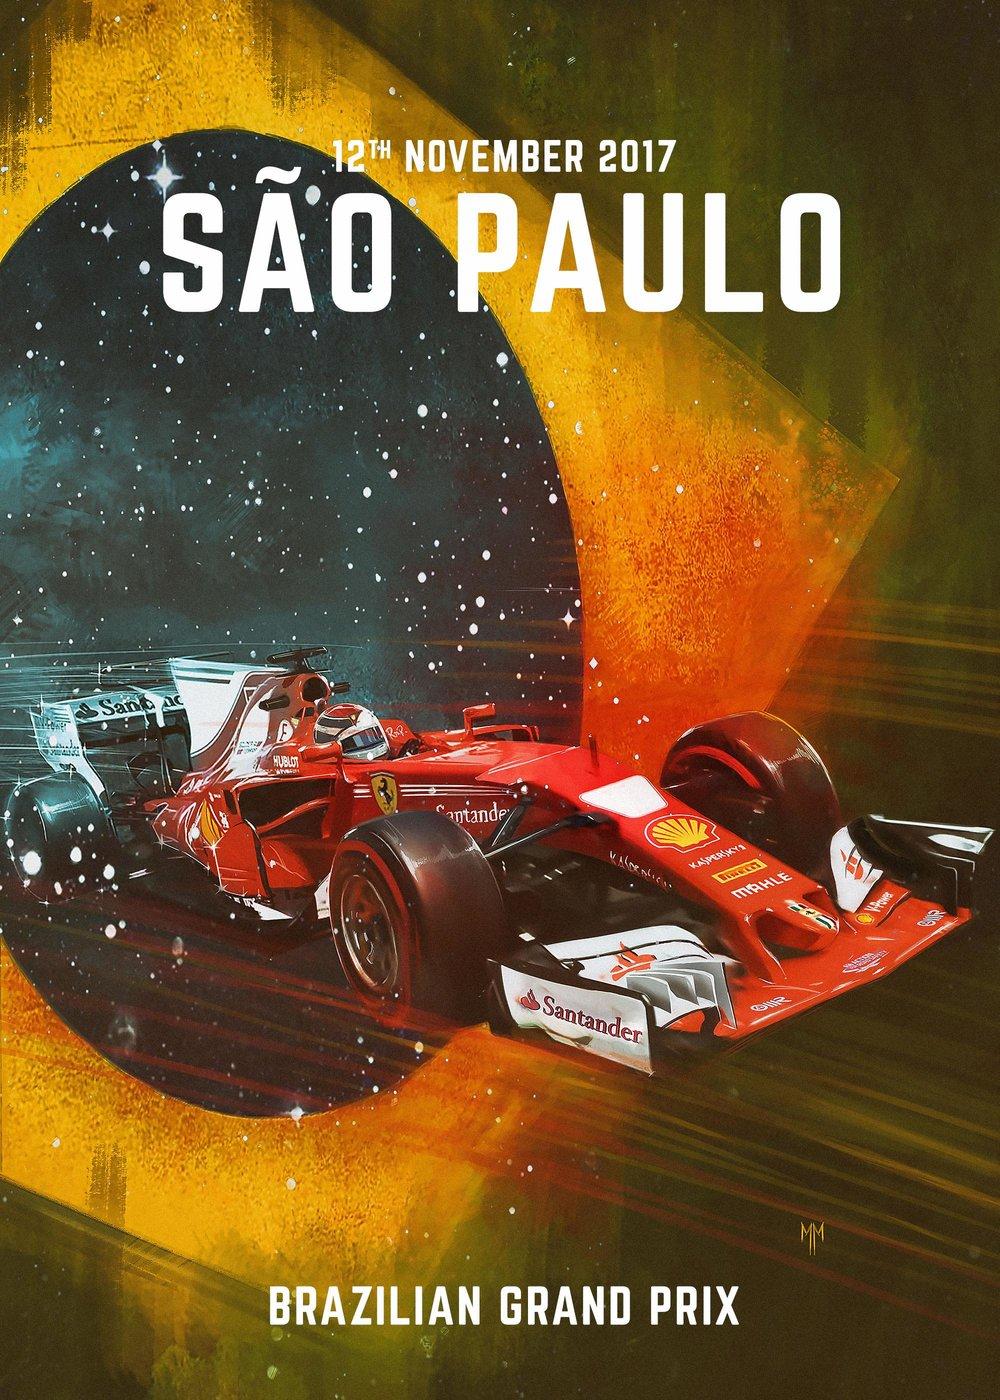 2017 Brazilian Grand Prix